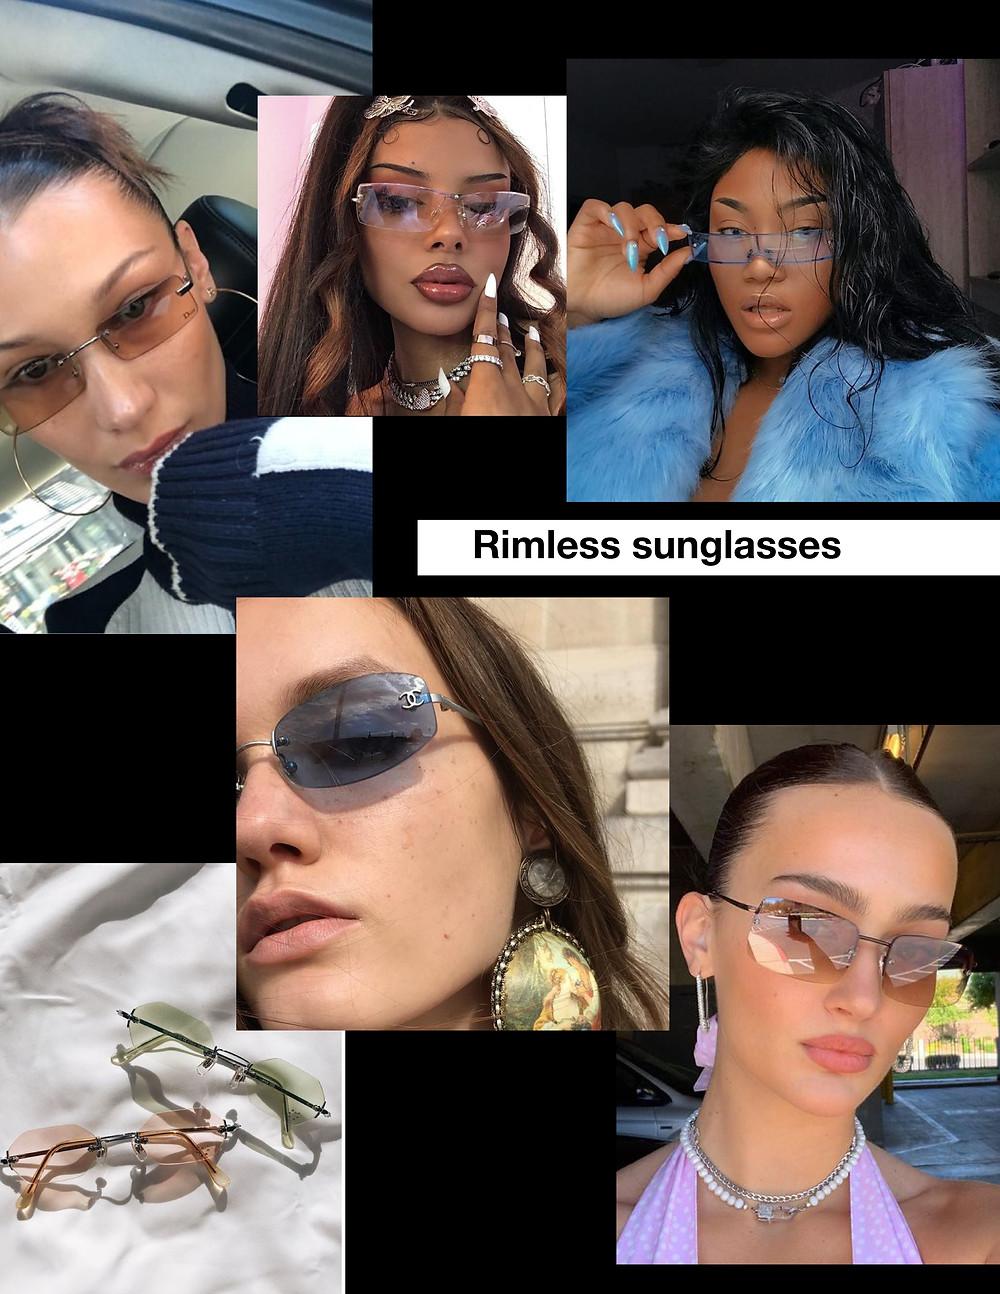 rimless sunglasses, fashion, trends, summer sunglasses